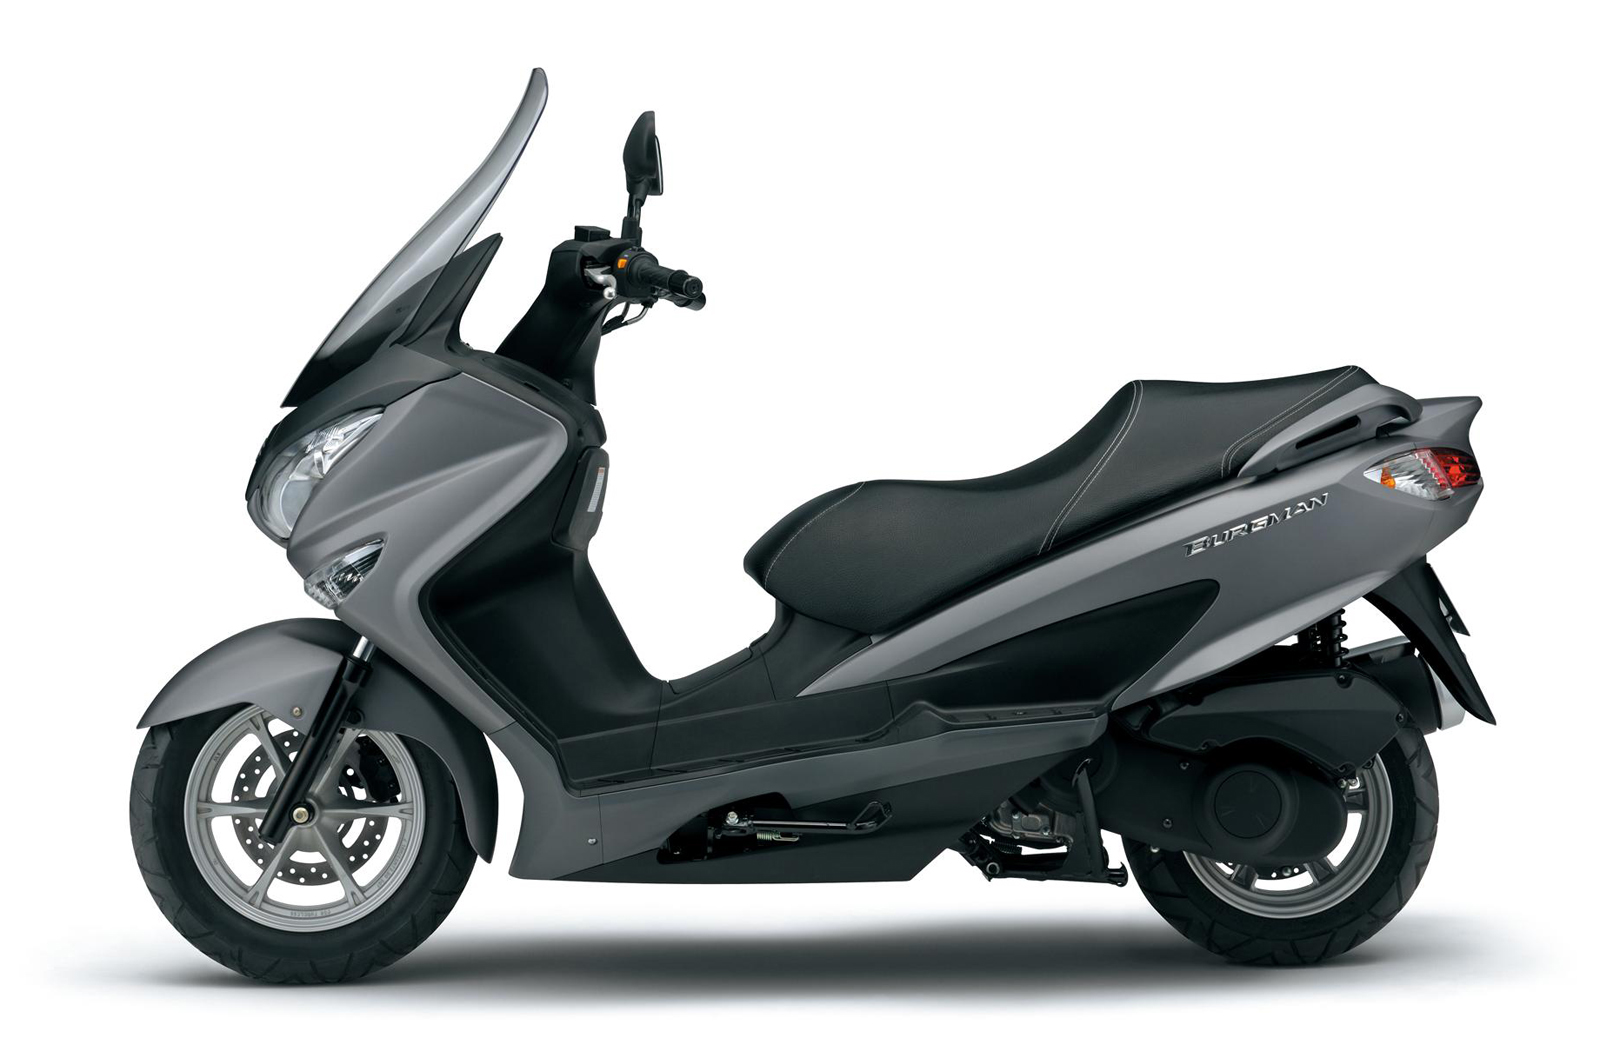 Suzuki Burgman 125 200 Listino Prezzo Scheda Tecnica